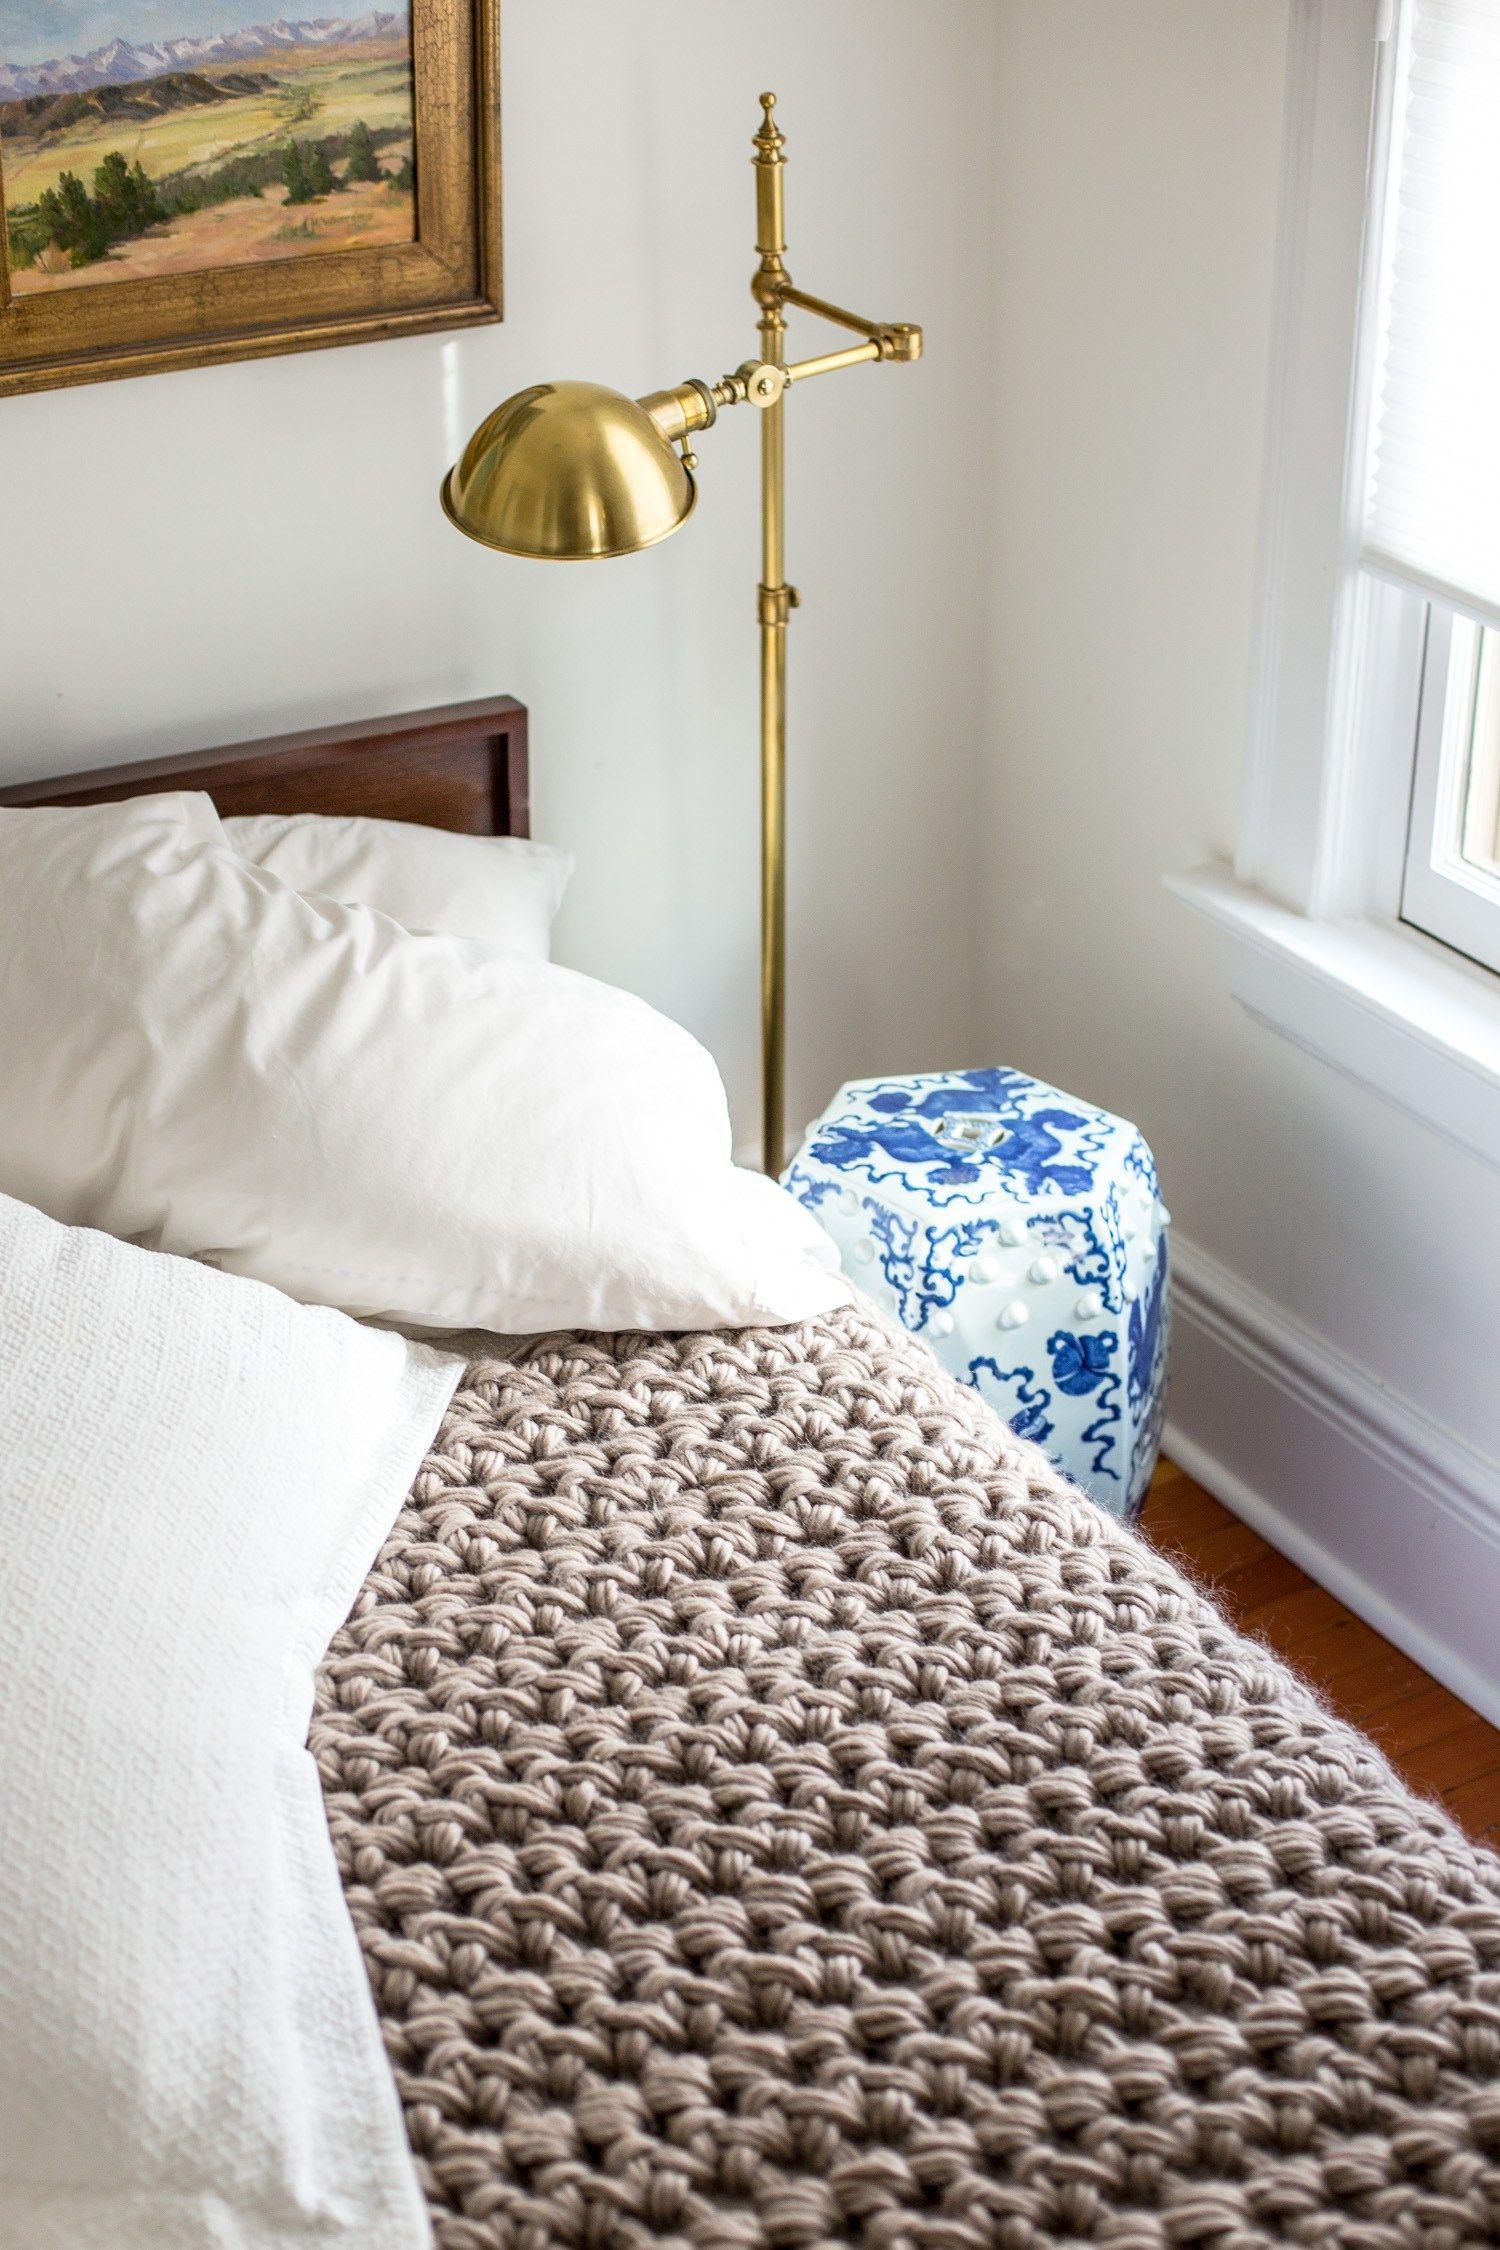 Gorgeous Hand Crochet Blanket in an Hour | Tejido gancho, Cobija y ...